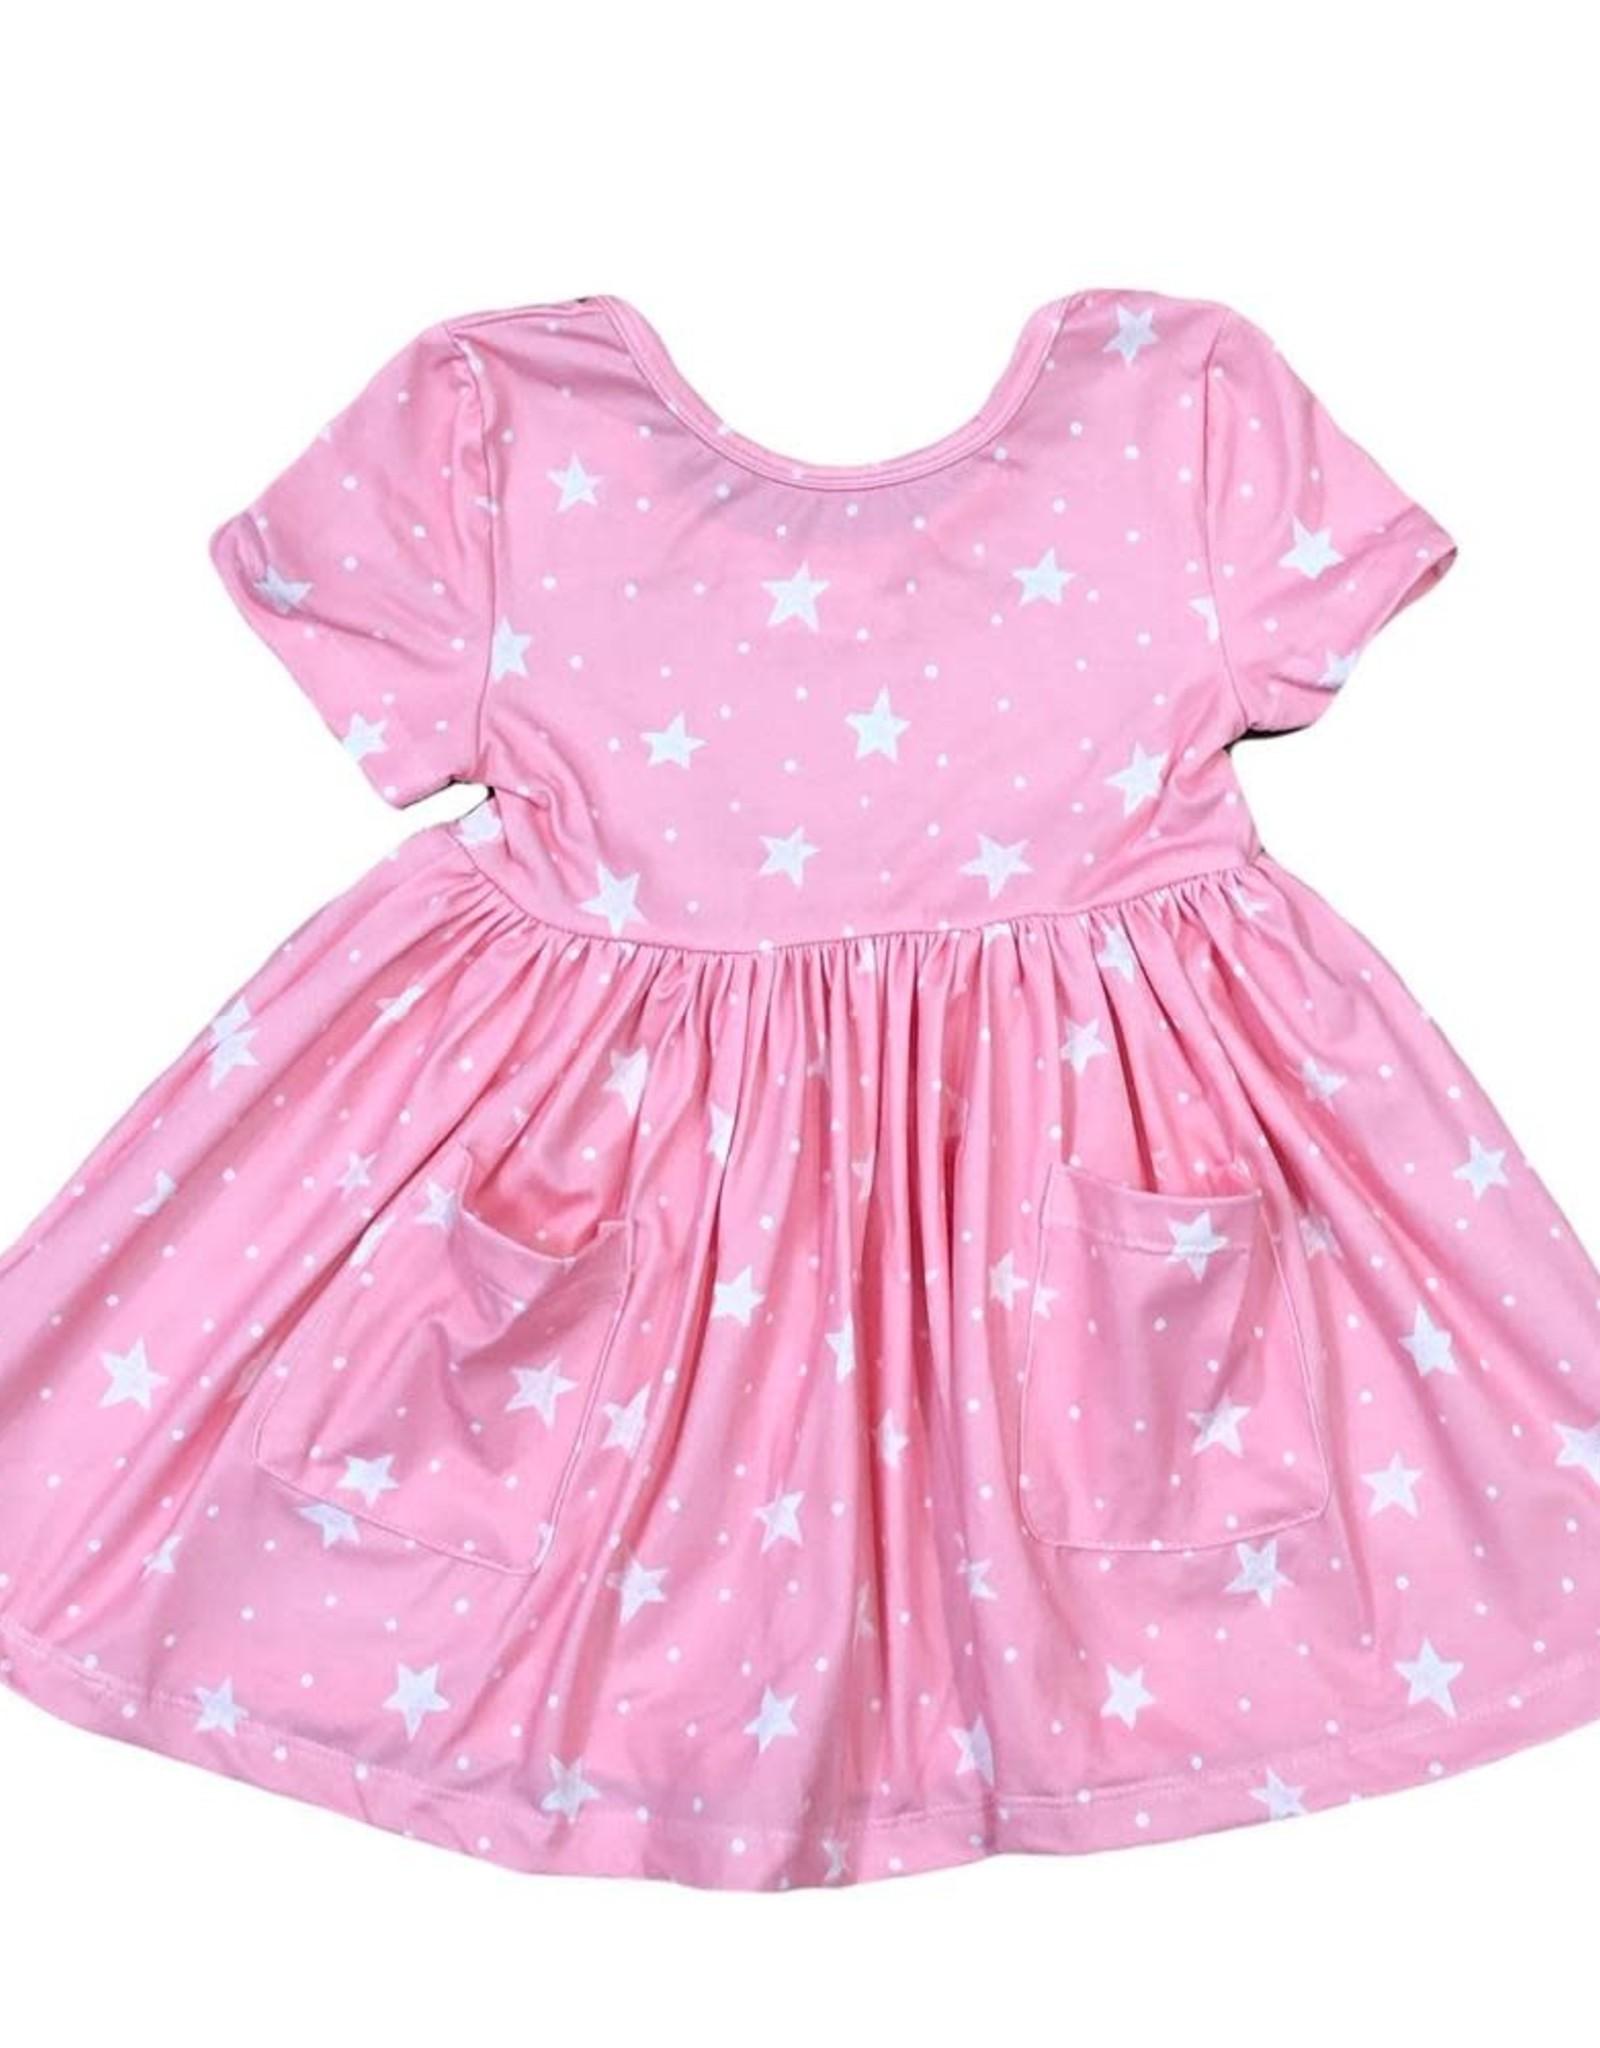 Mila & Rose Pink Star S/S Pocket Twirl Dress